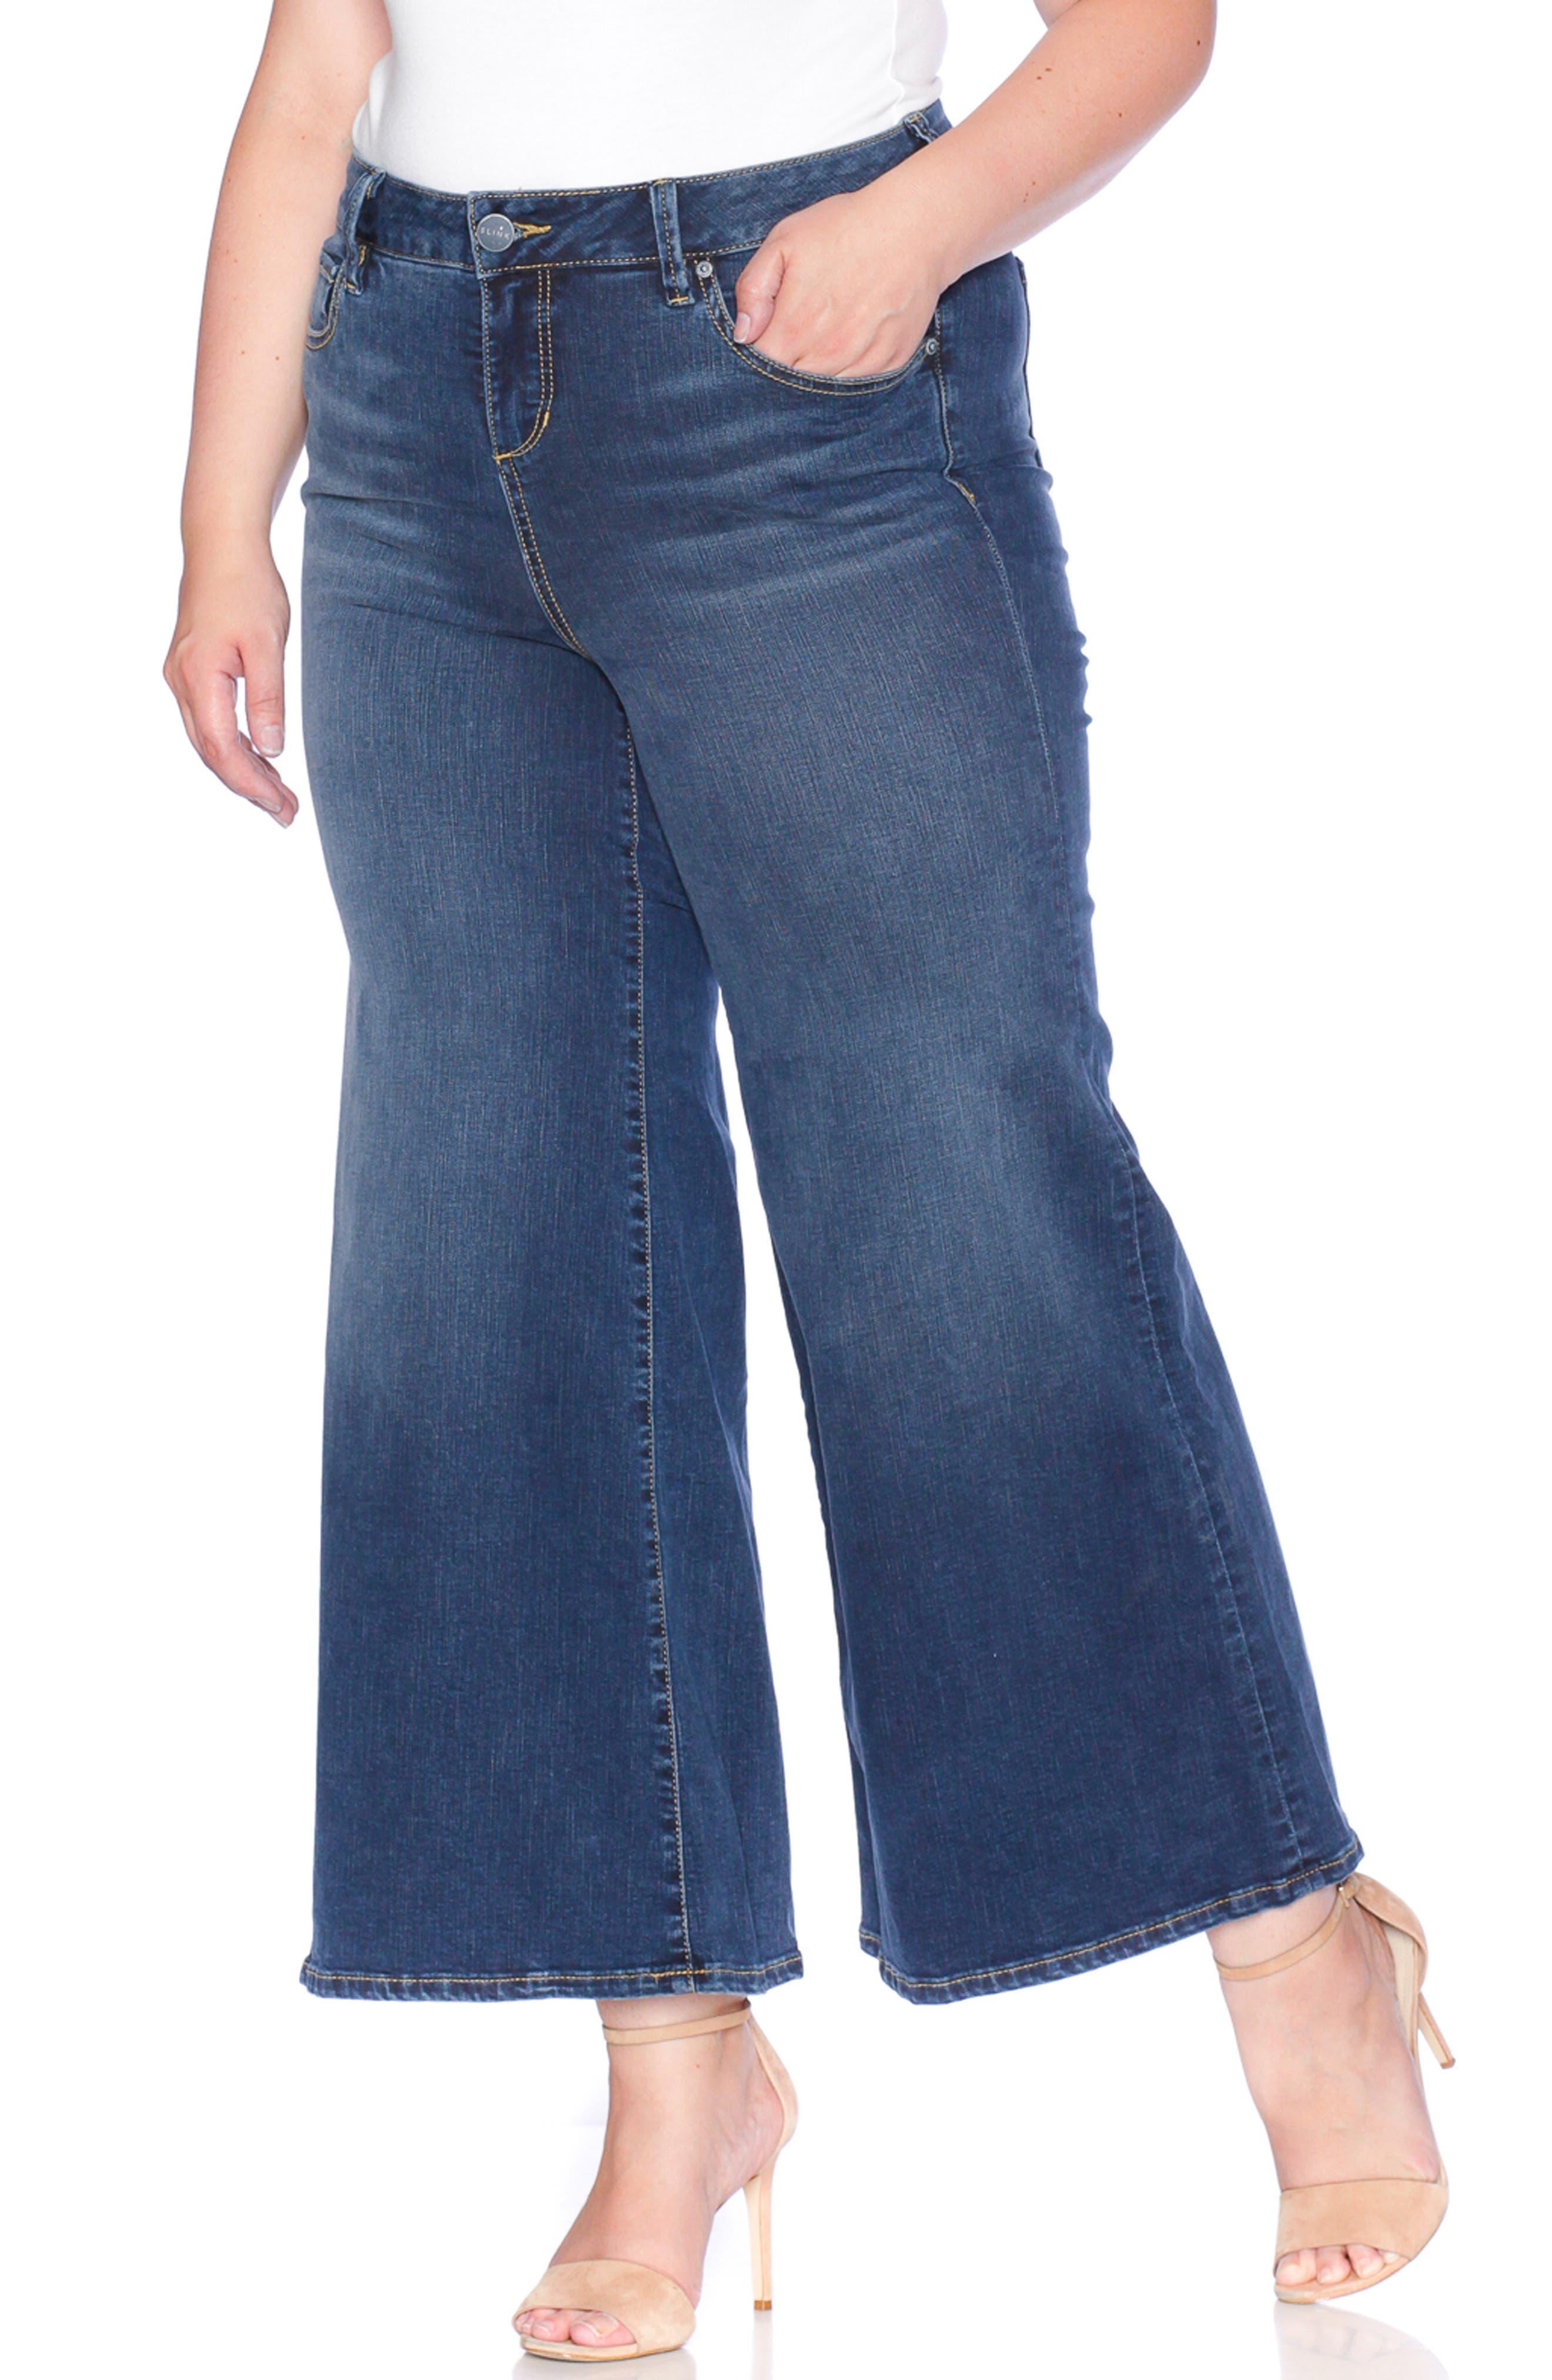 SLINK JEANS SLINK High Waist Wide Leg Crop Jeans, Main, color, HEATHER